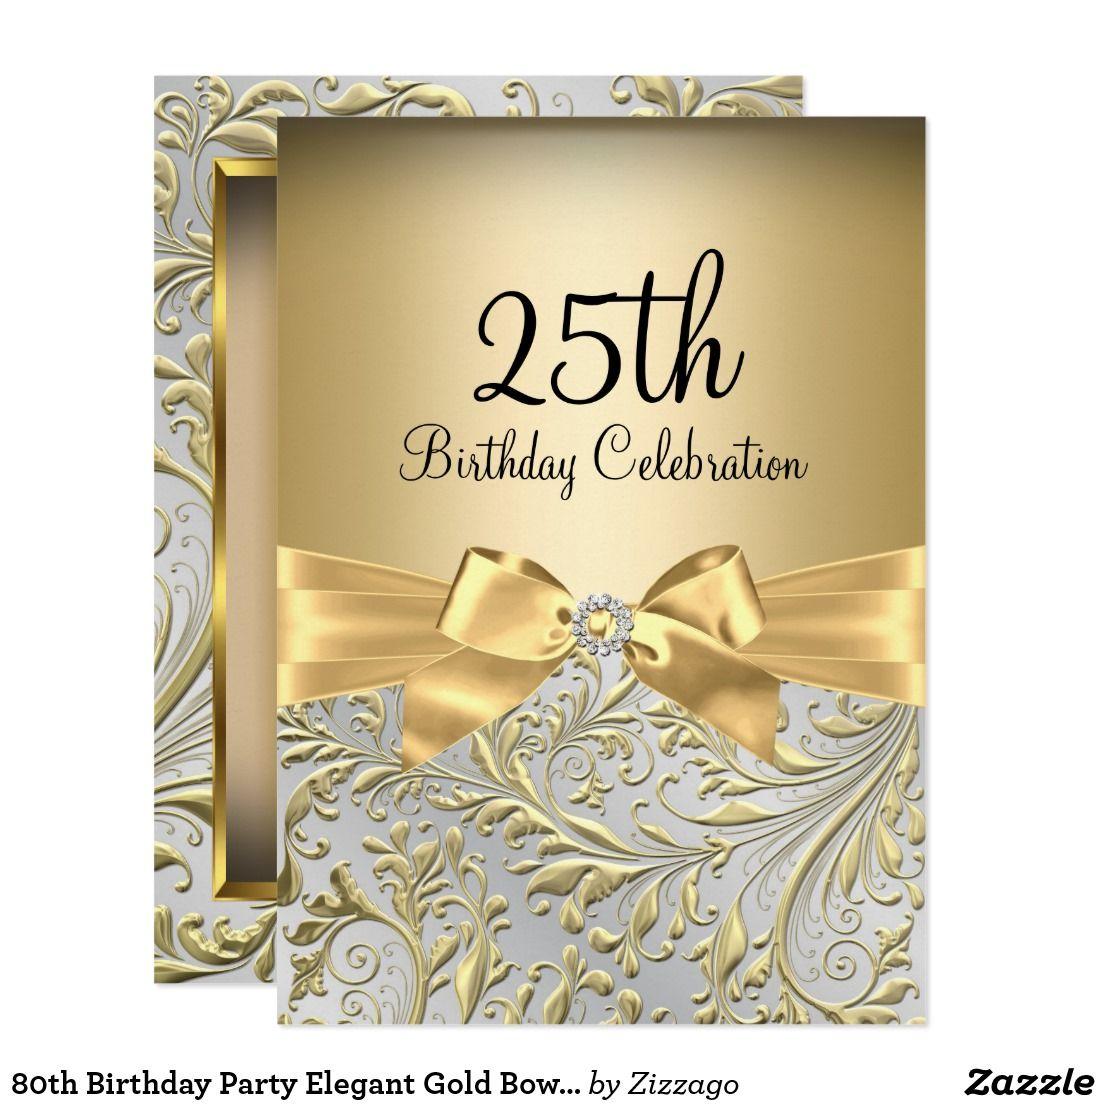 80th Birthday Party Elegant Gold Bow Floral Swirl